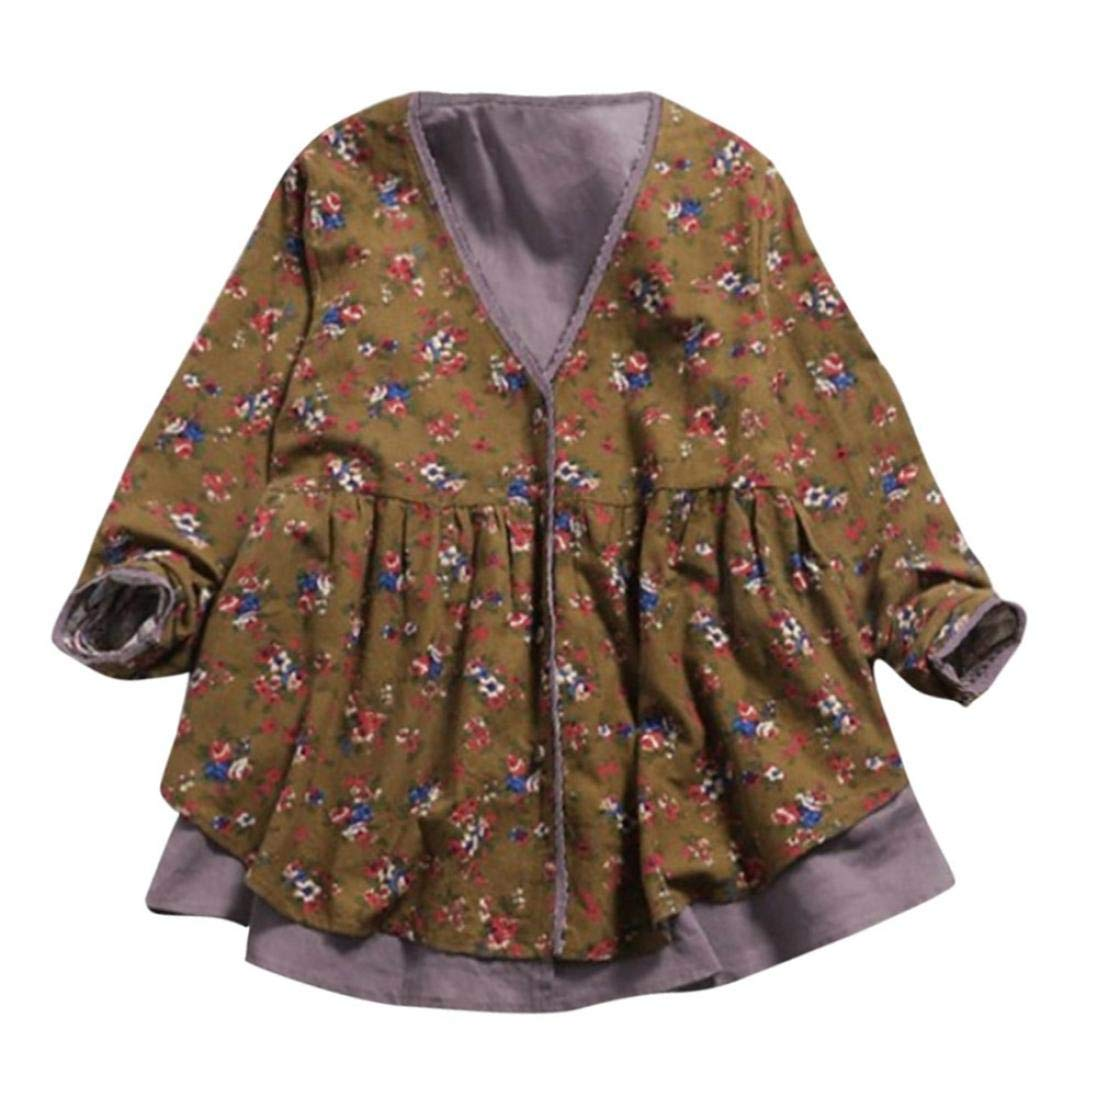 Hem Henleys Tops, Clearance Duseedik Women Cotton Linen Print Double-Layer Fake Two Pieces Loose V Neck Coat Blouse